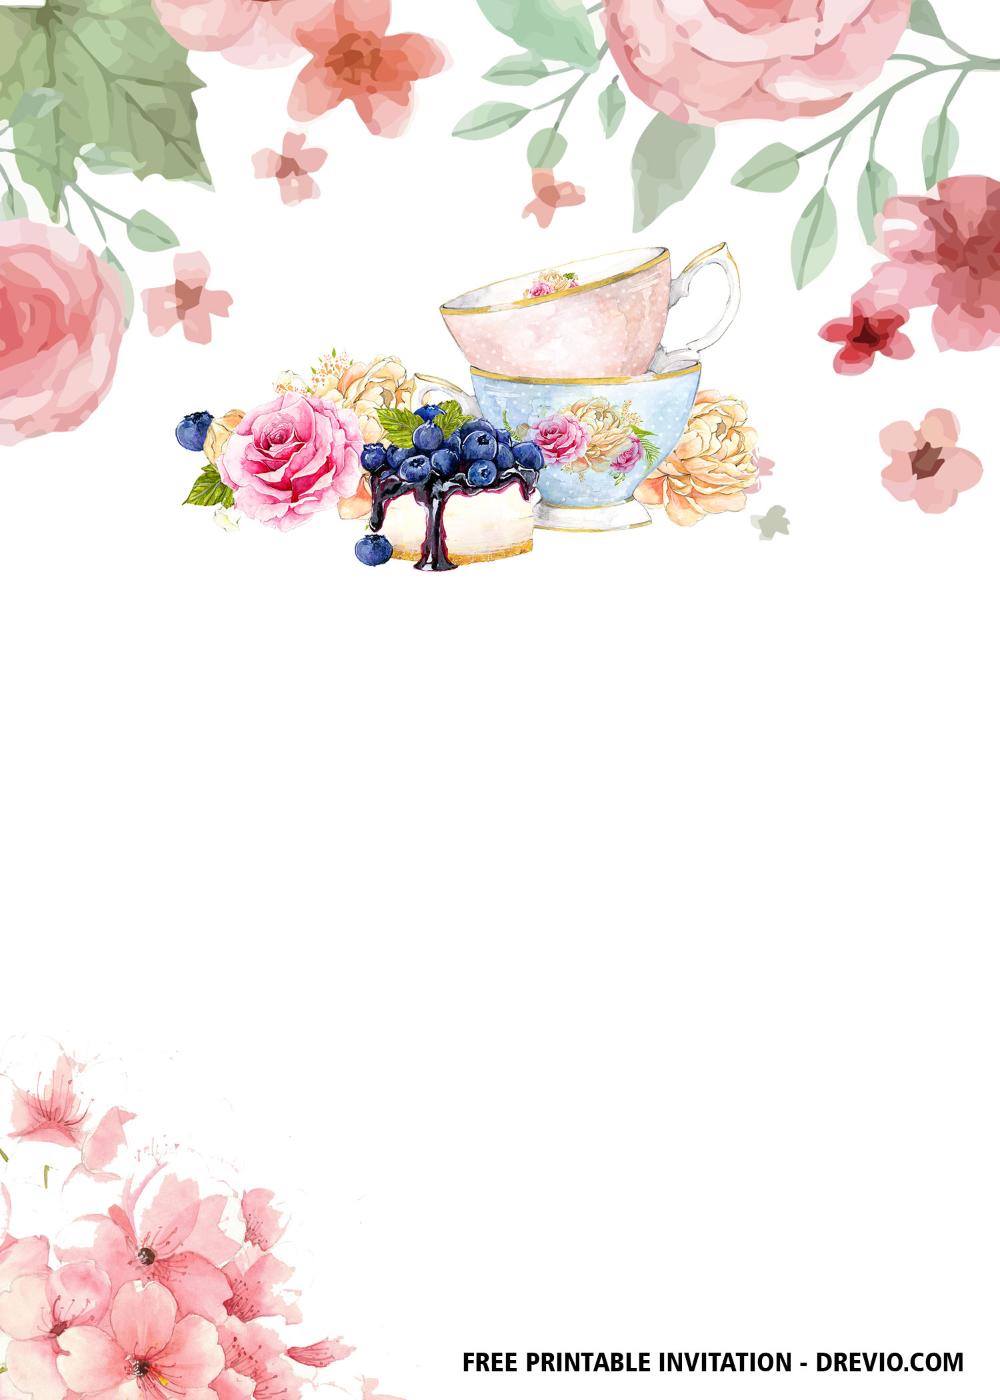 Free Floral Tea Party Invitation Templates Drevio In 2020 Tea Party Invitations Party Invite Template Tea Party